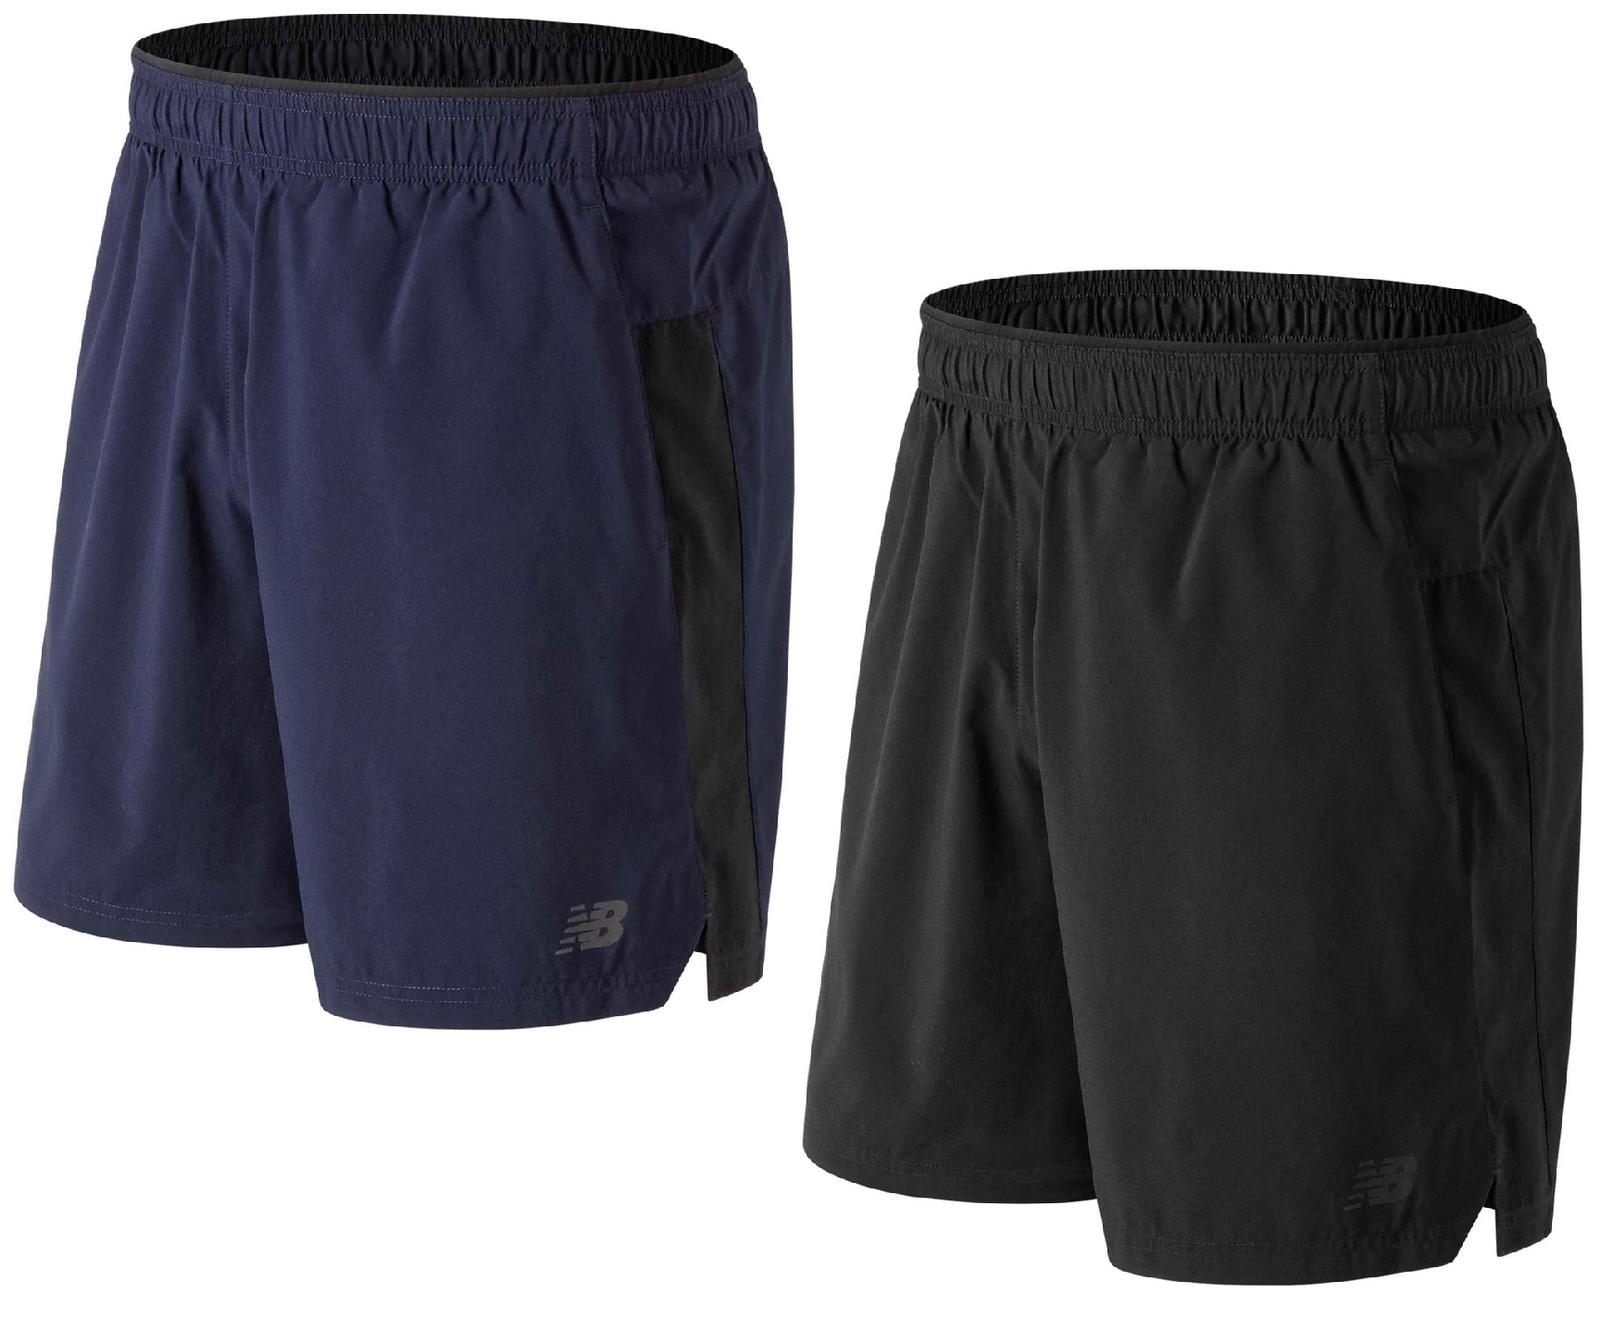 New Balance Herren Shorts Kurzhose Sporthose Fußball Jogging Core 2in1 3322